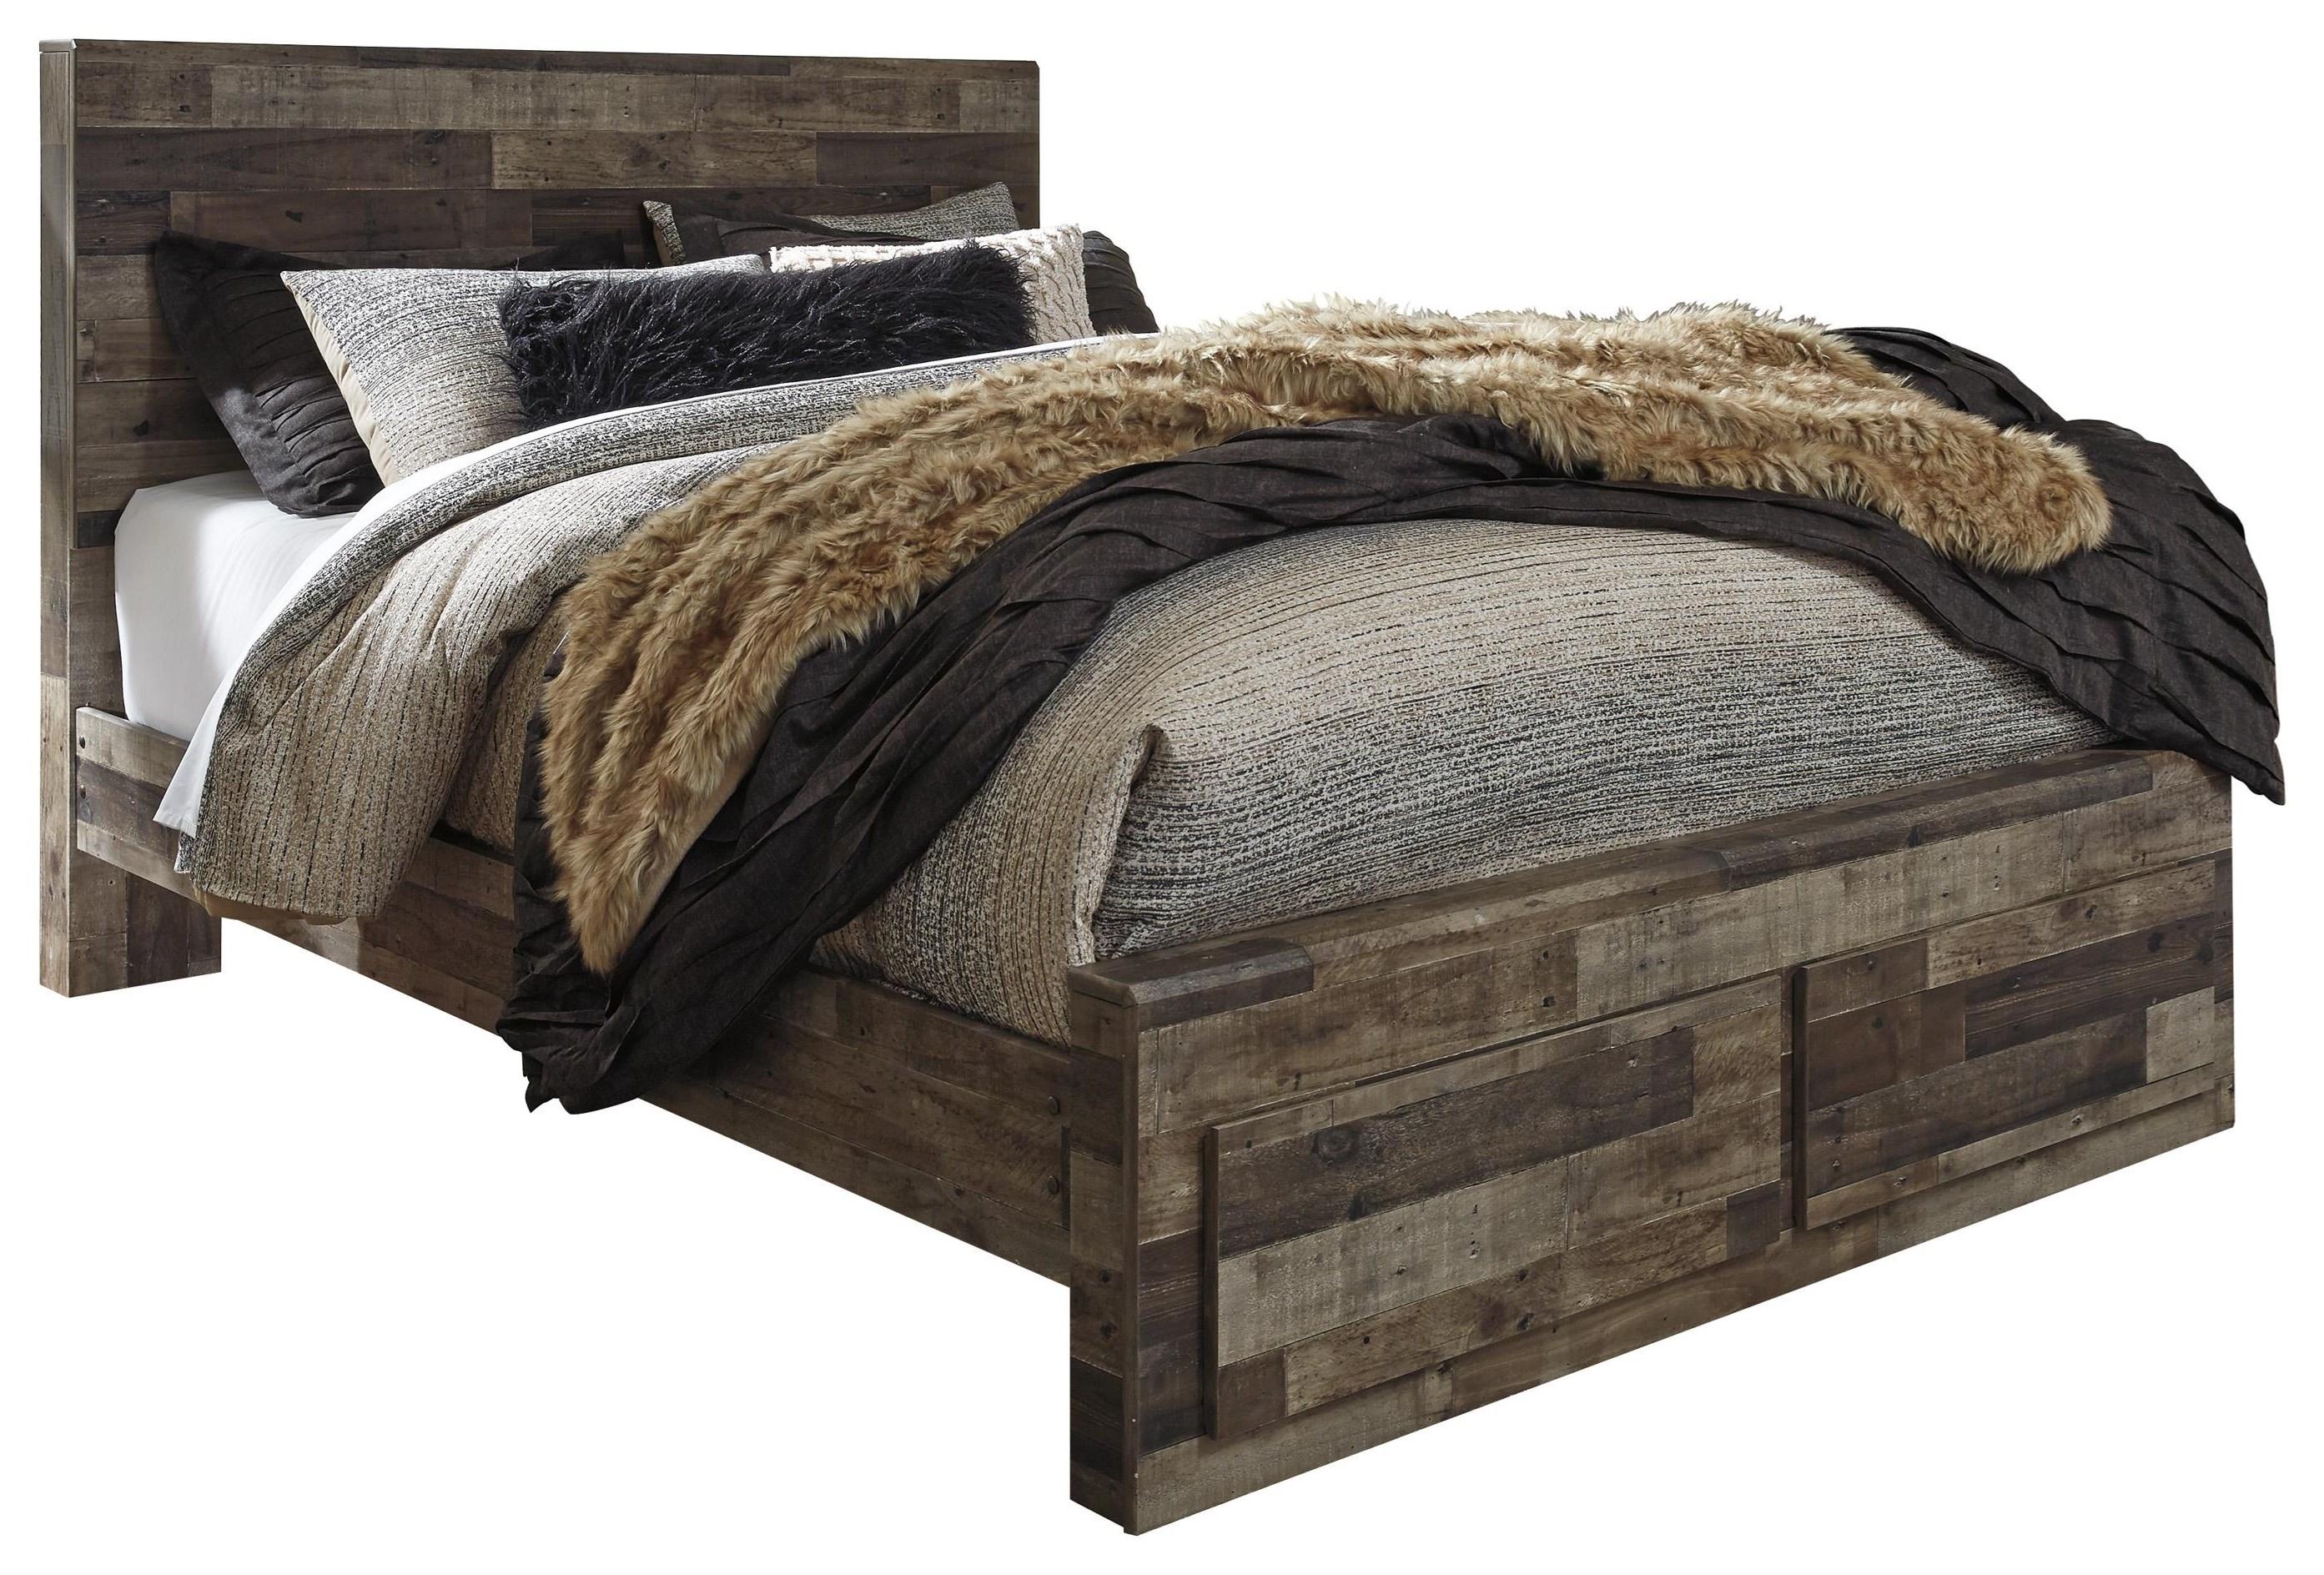 Derekson Derekson King Storage Bed by Ashley at Morris Home